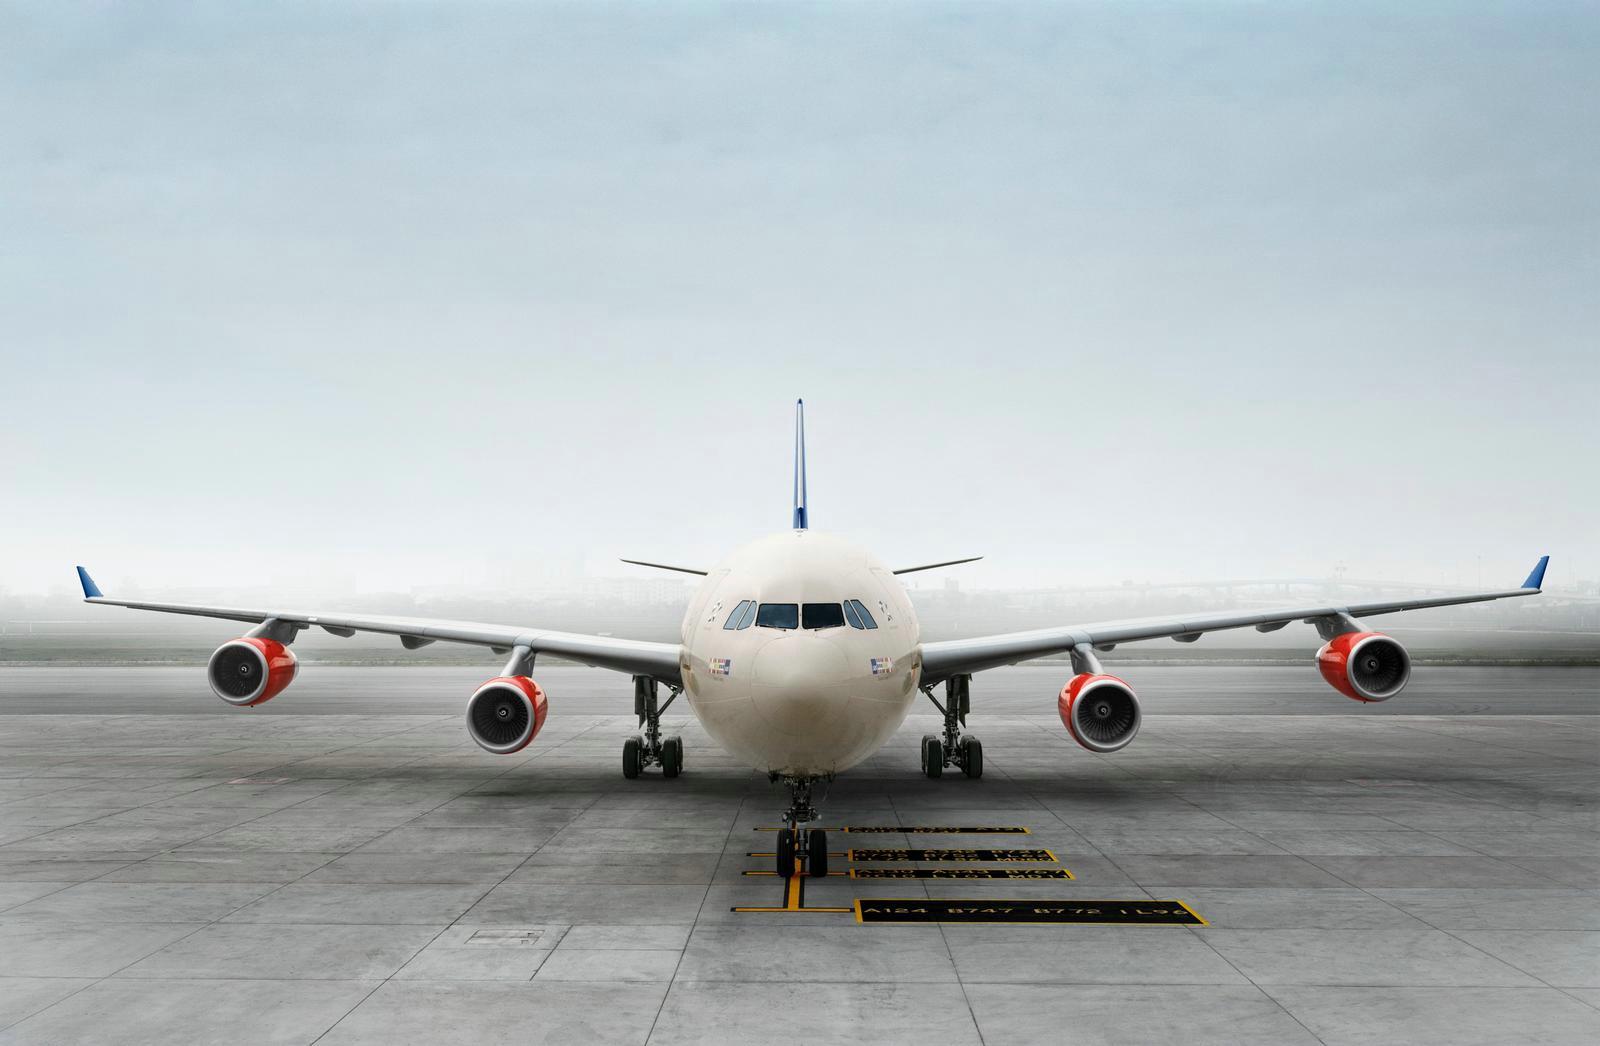 SAS Airbus A340-300 i Stockholm-Arlanda. (Foto: SAS)